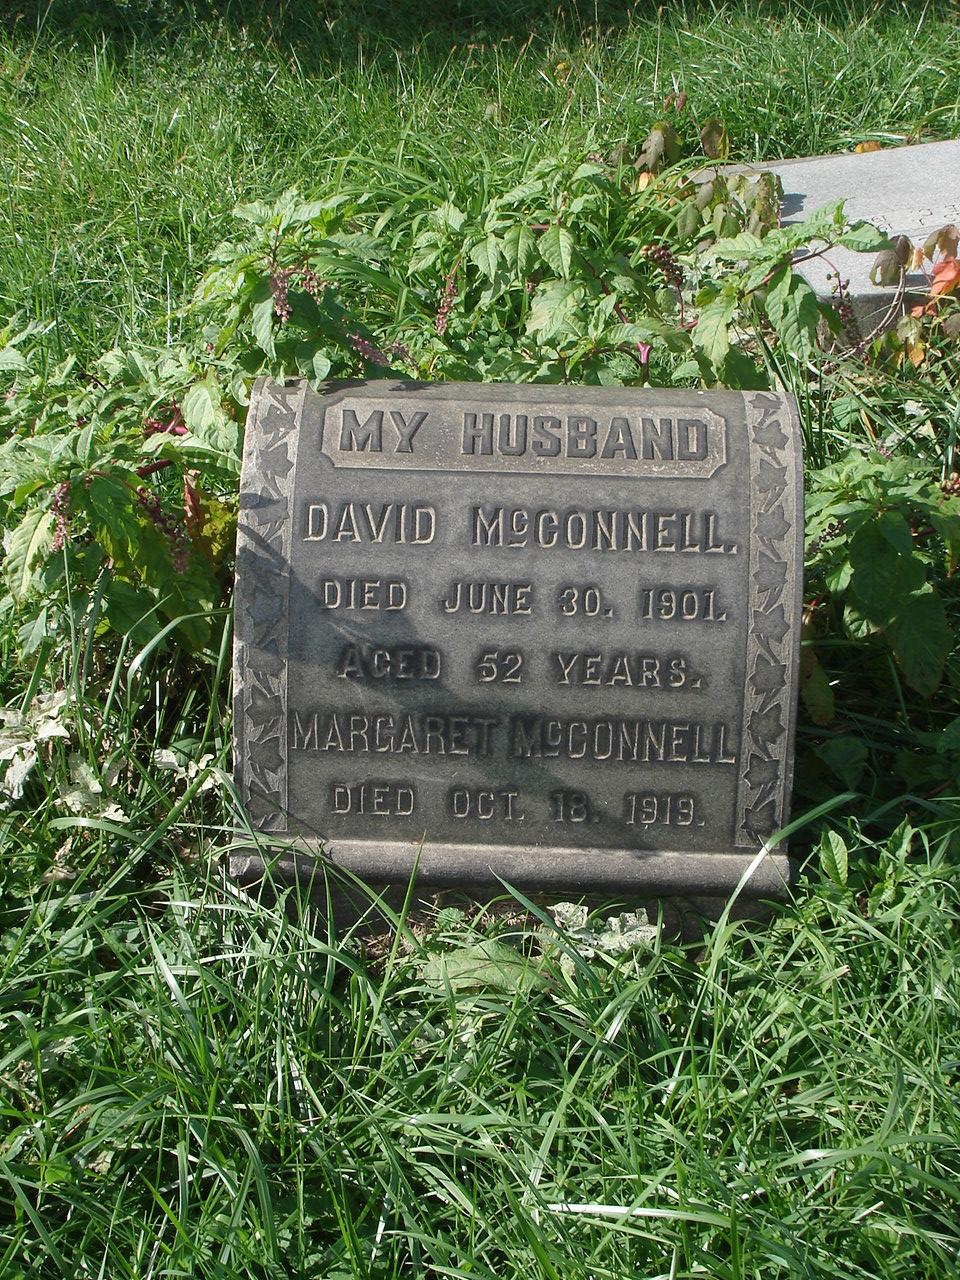 Special Policeman David McConnell | Pennsylvania Railroad Police Department, Railroad Police